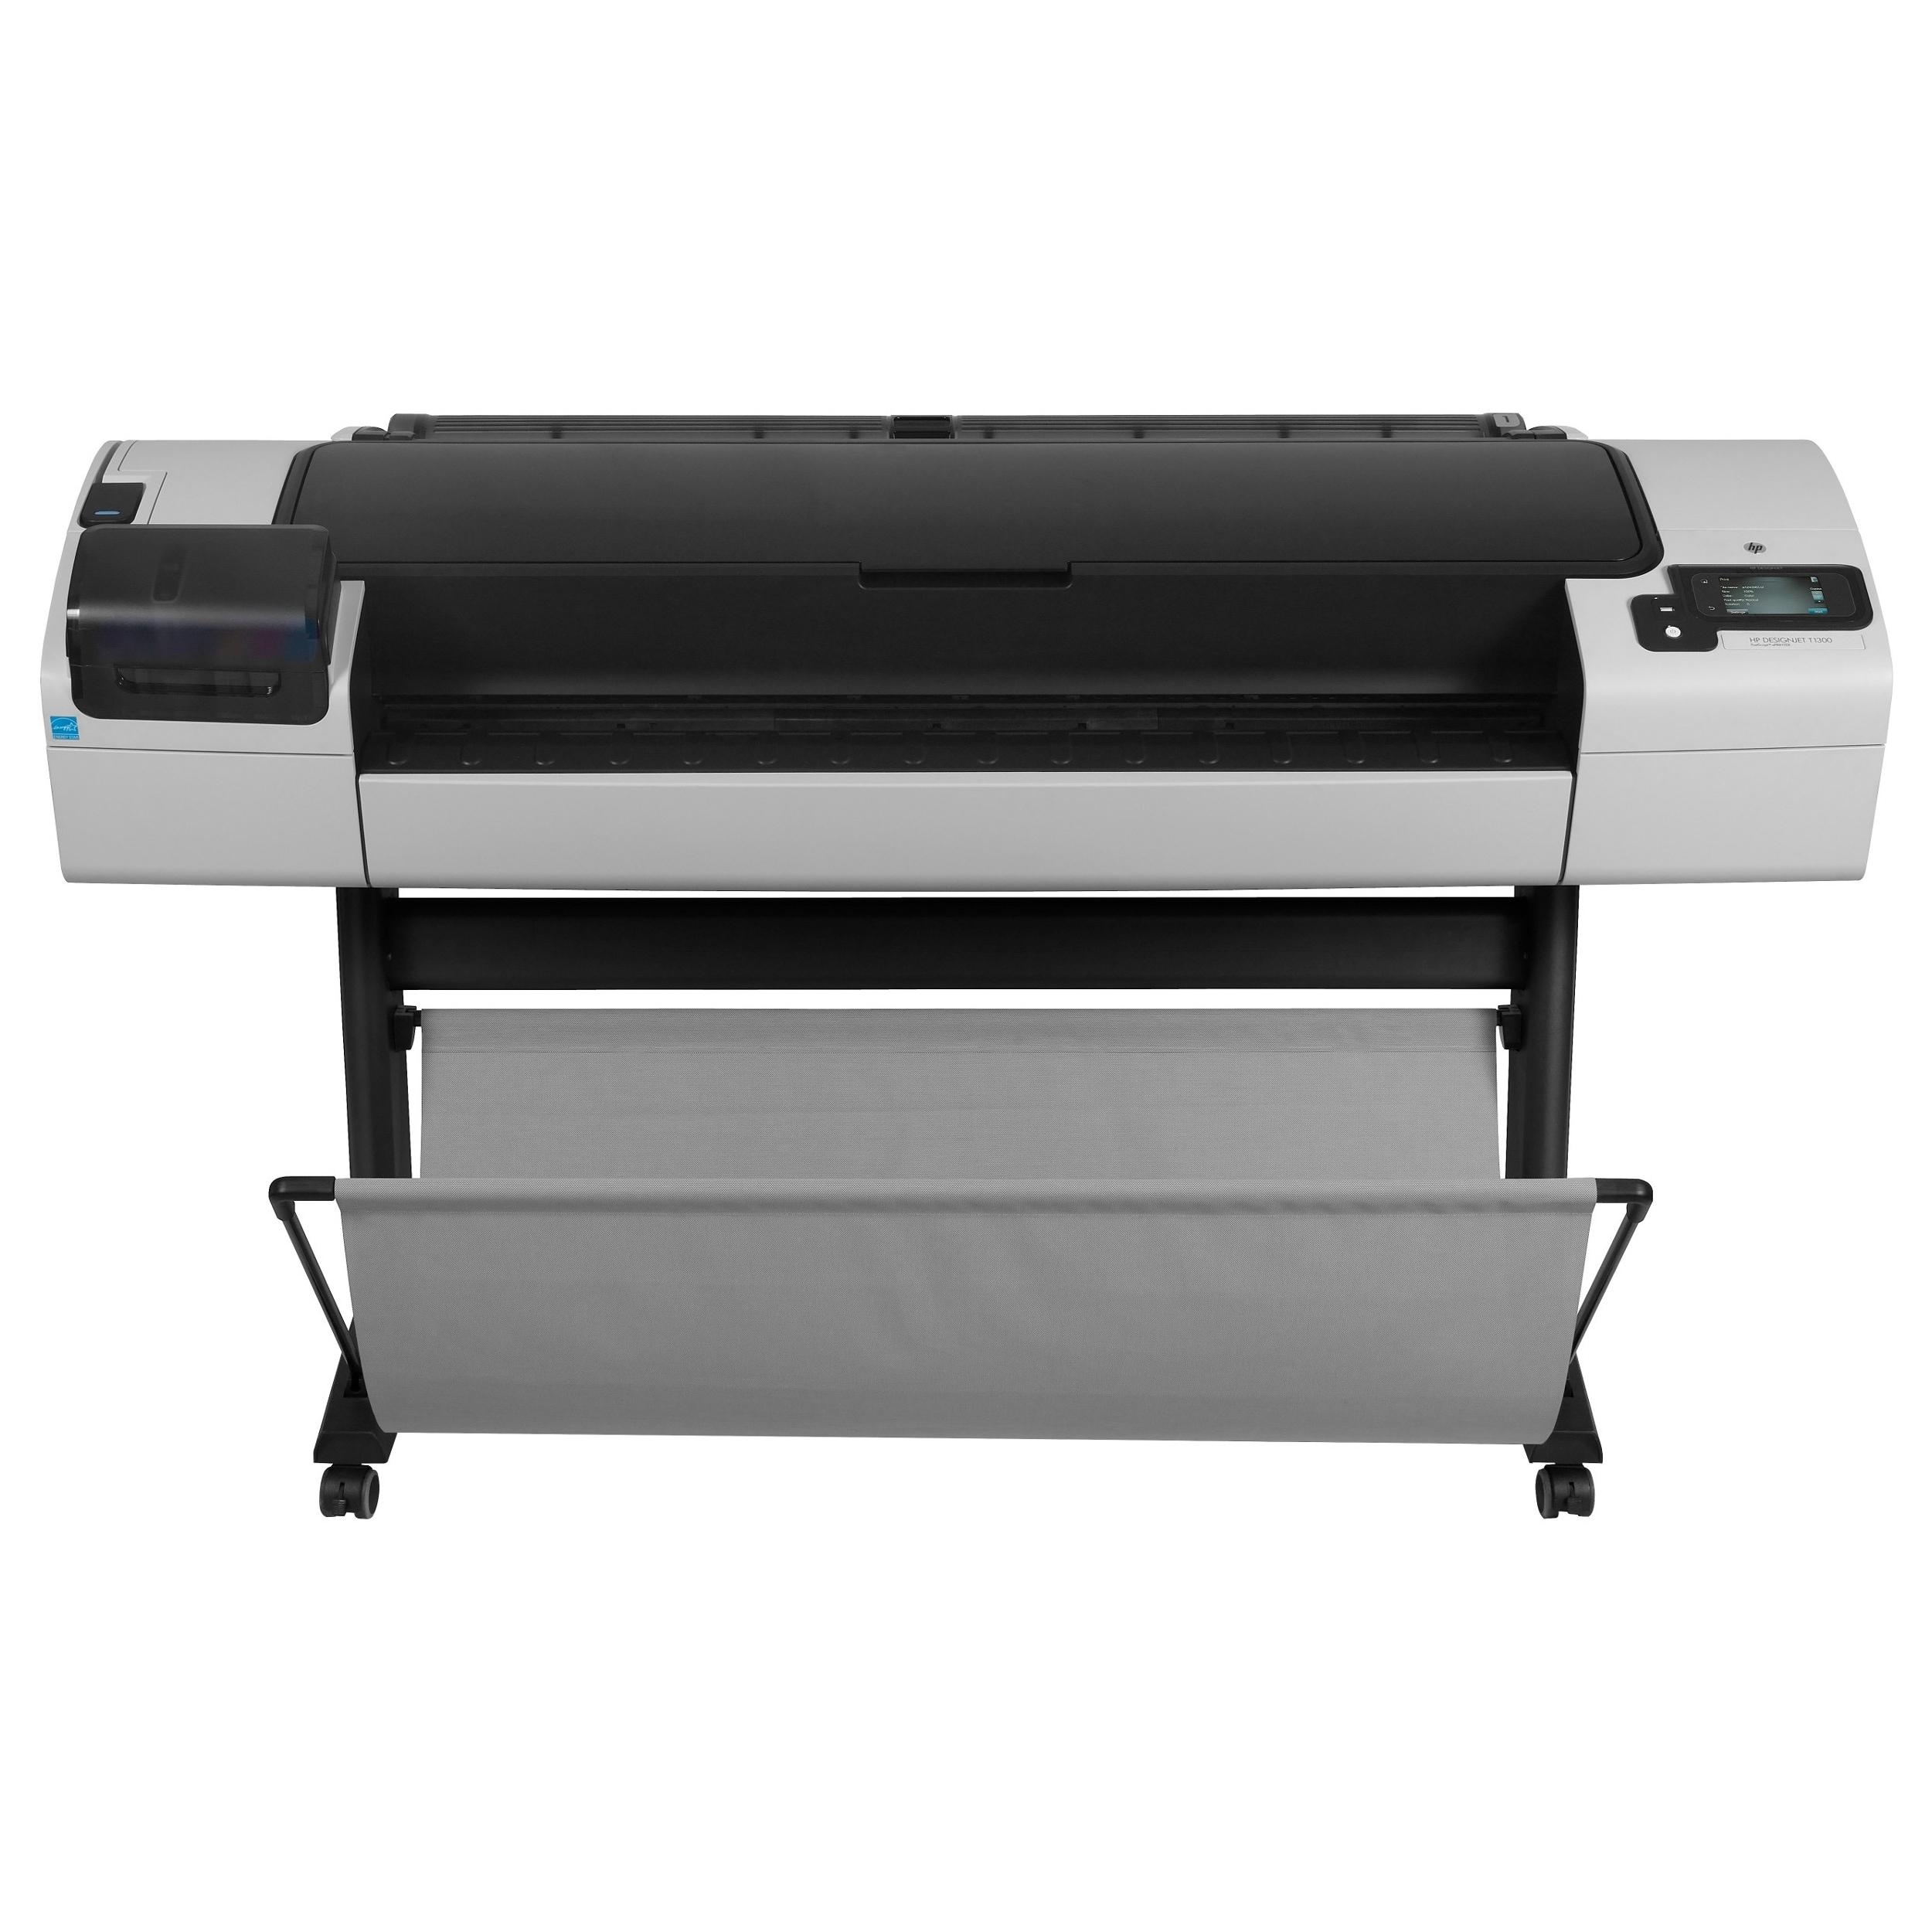 HP Designjet T1300 PostScript Inkjet Large Format Printer...